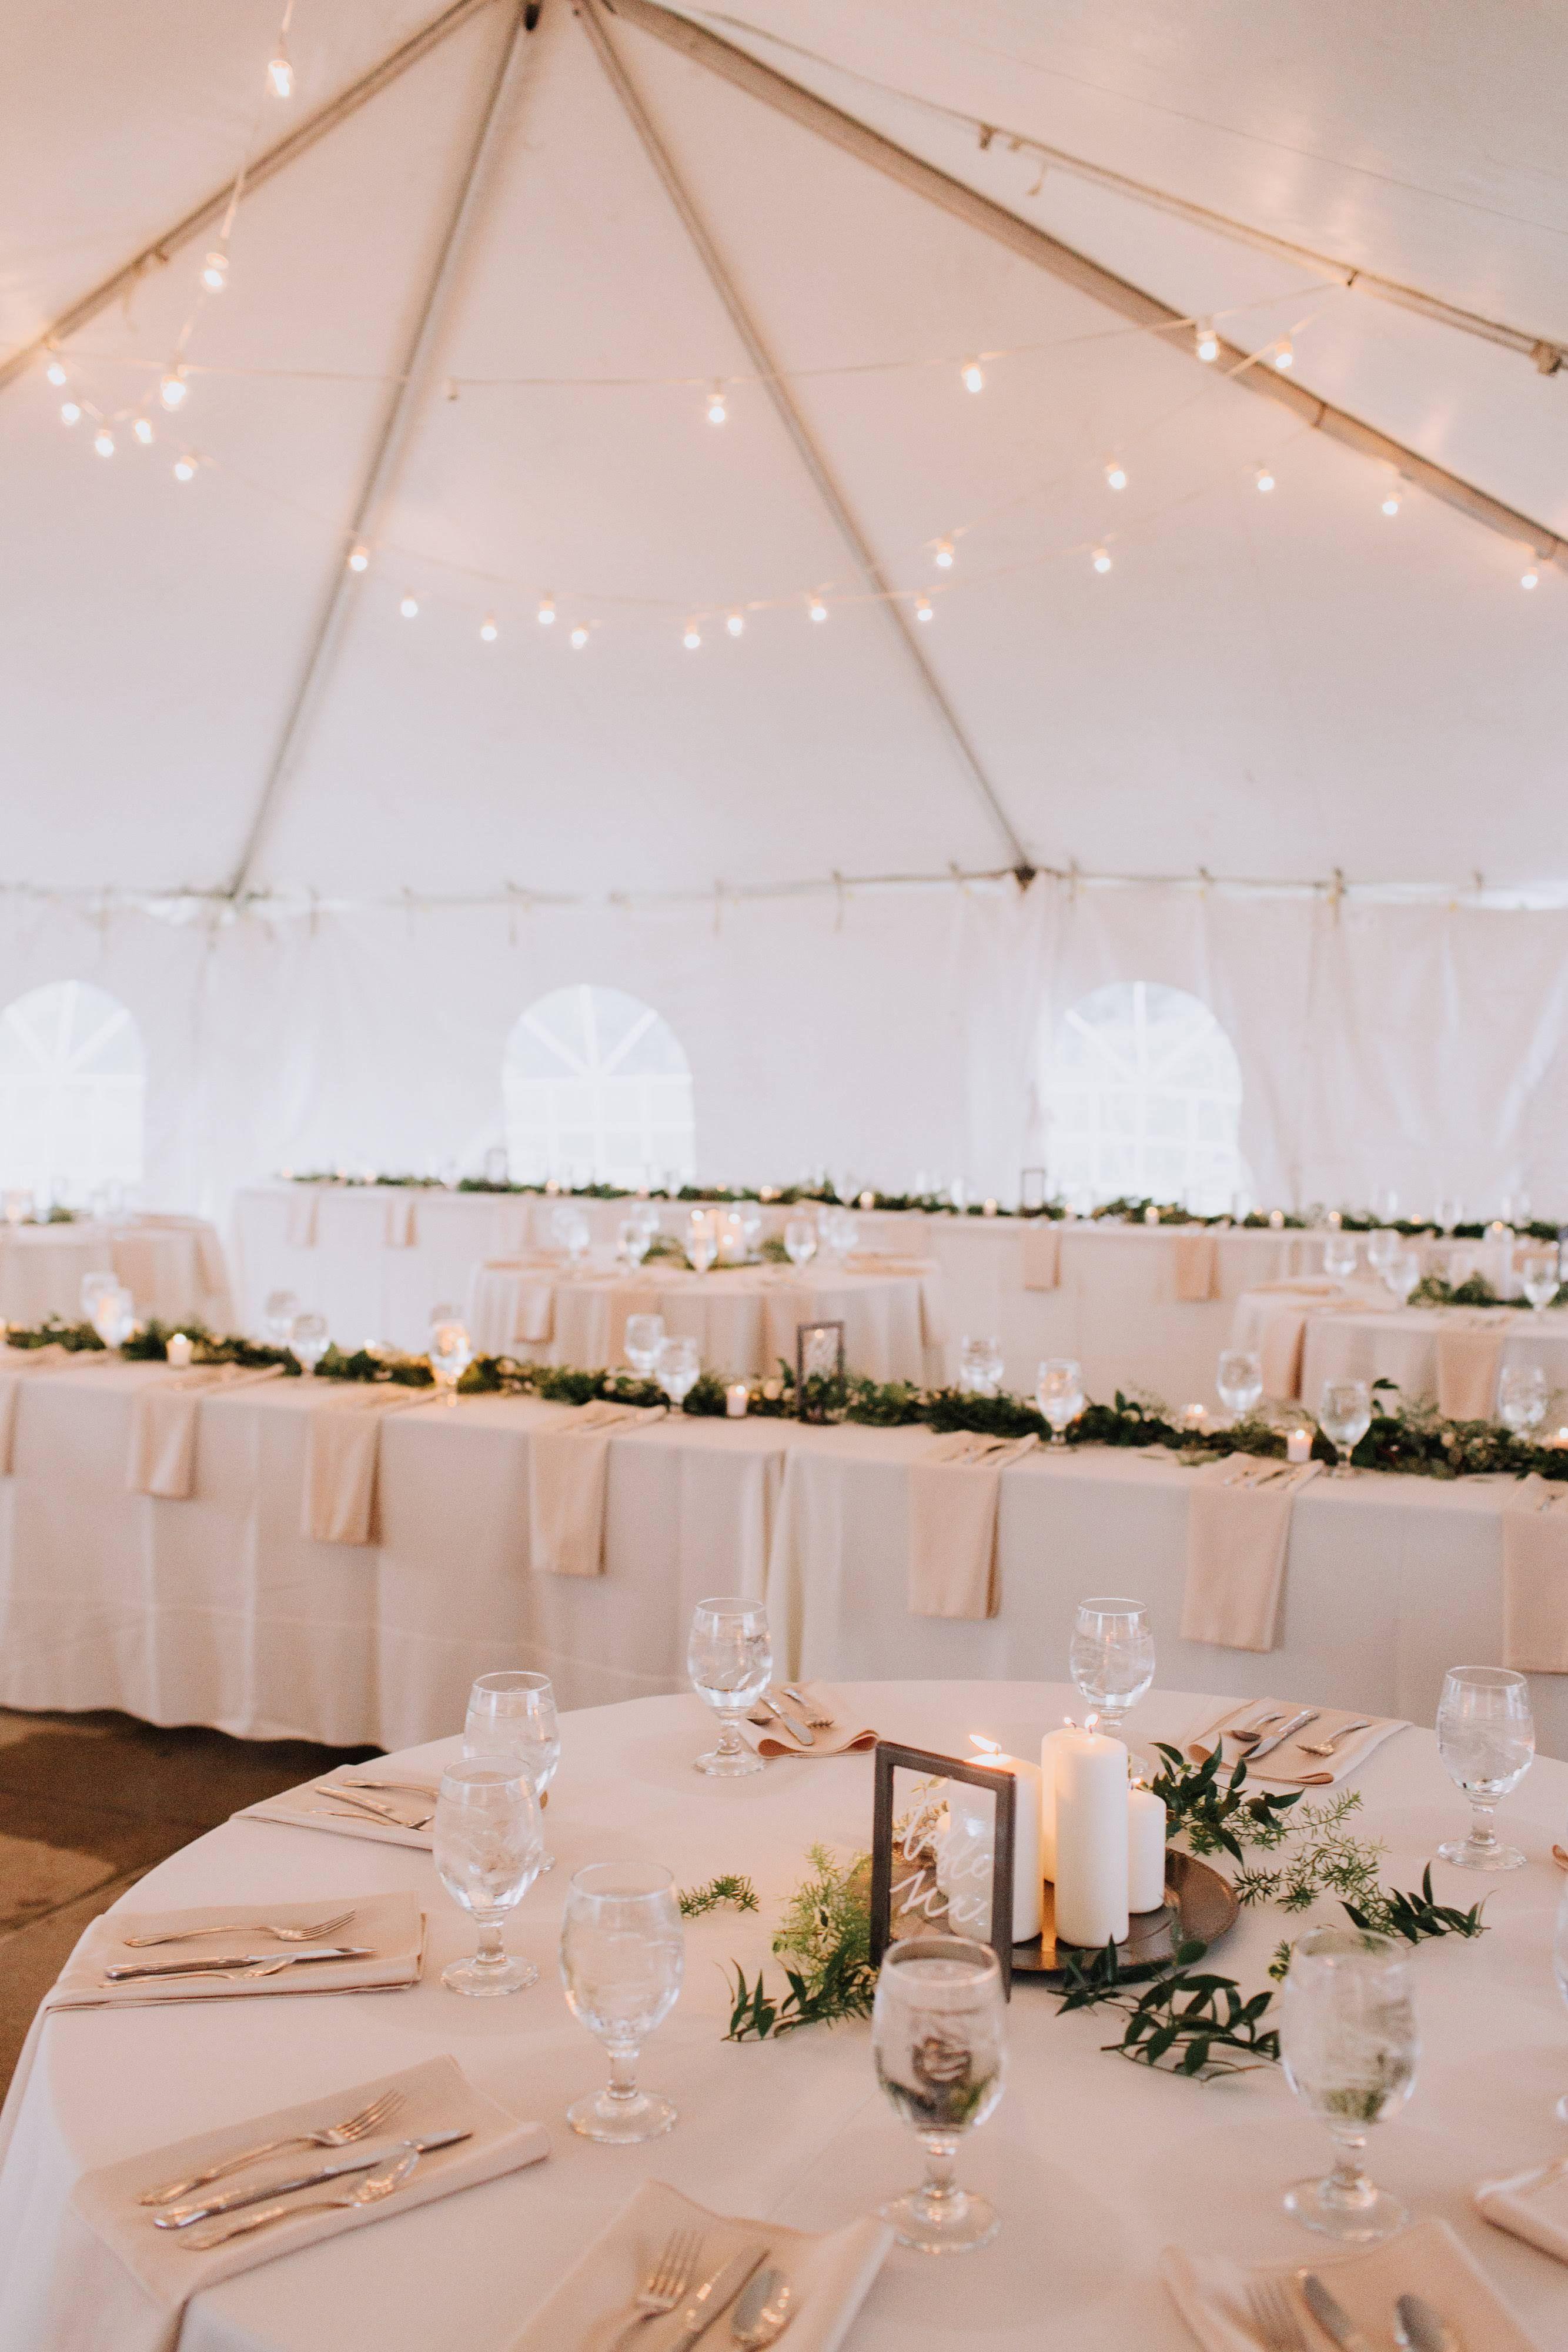 Wedding Reception Tent Event Rental Wedding Rentals Party Event